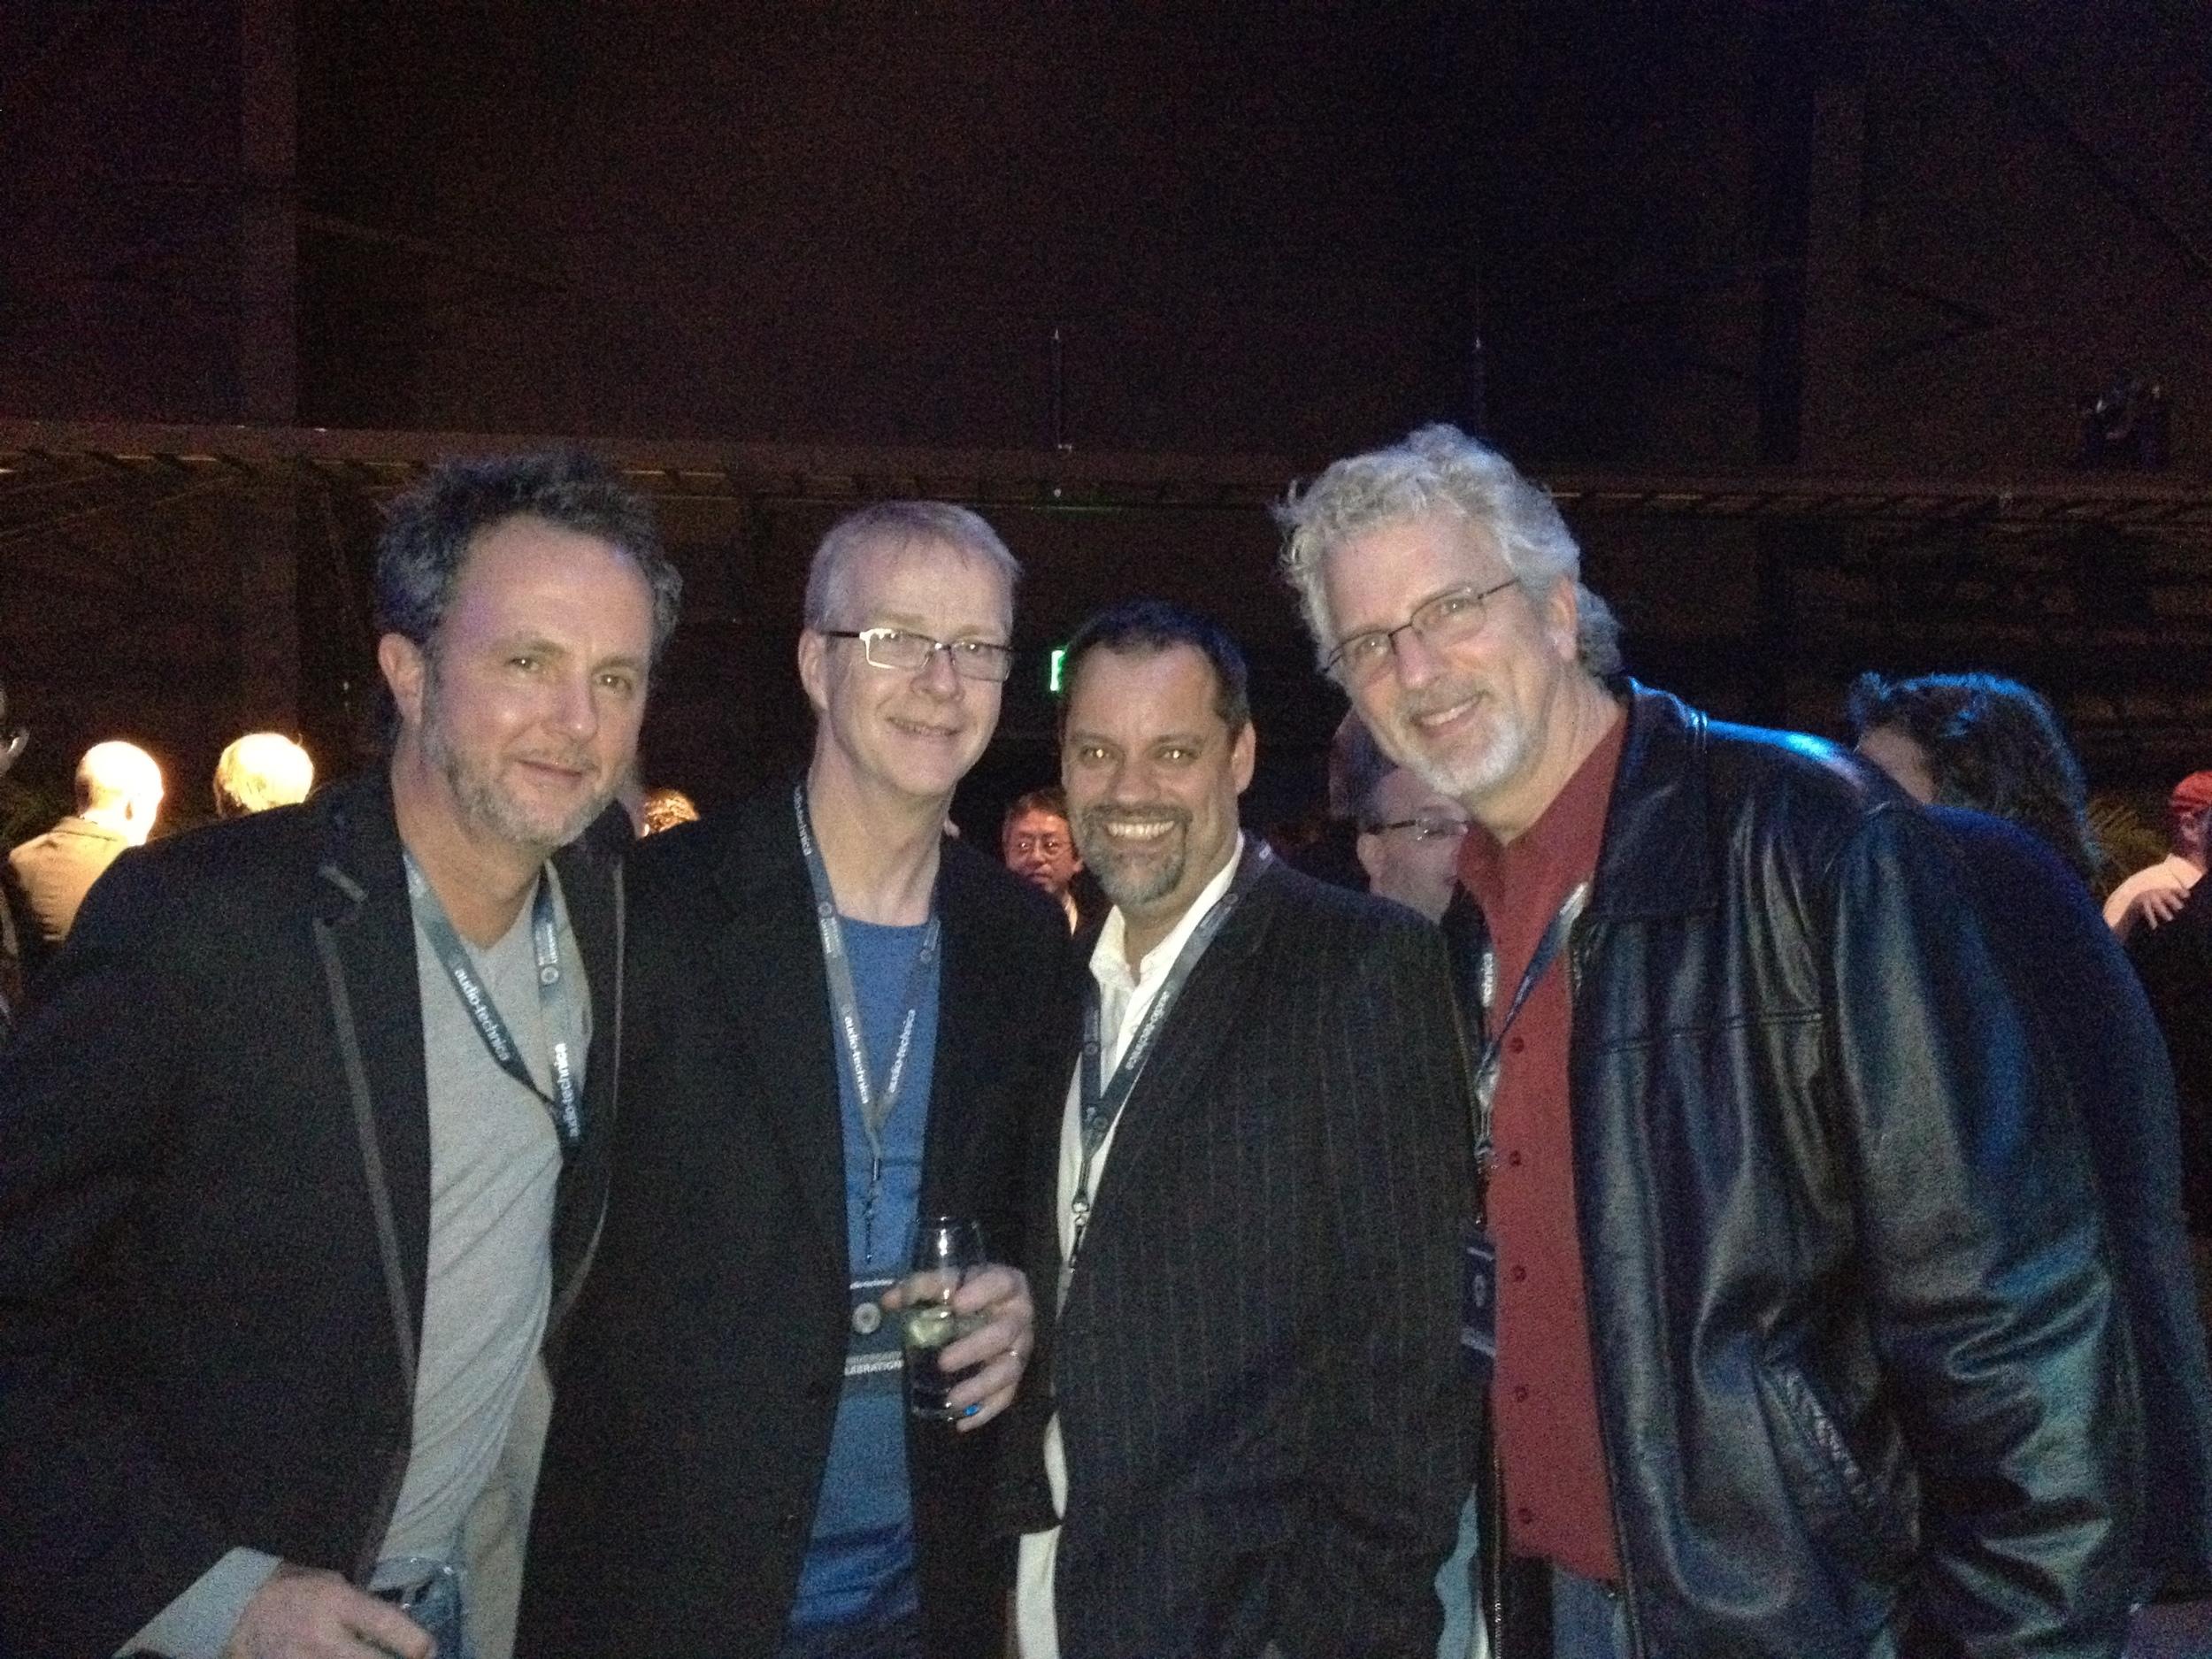 CJ Vanston, Peter Doell, SG, David Cole